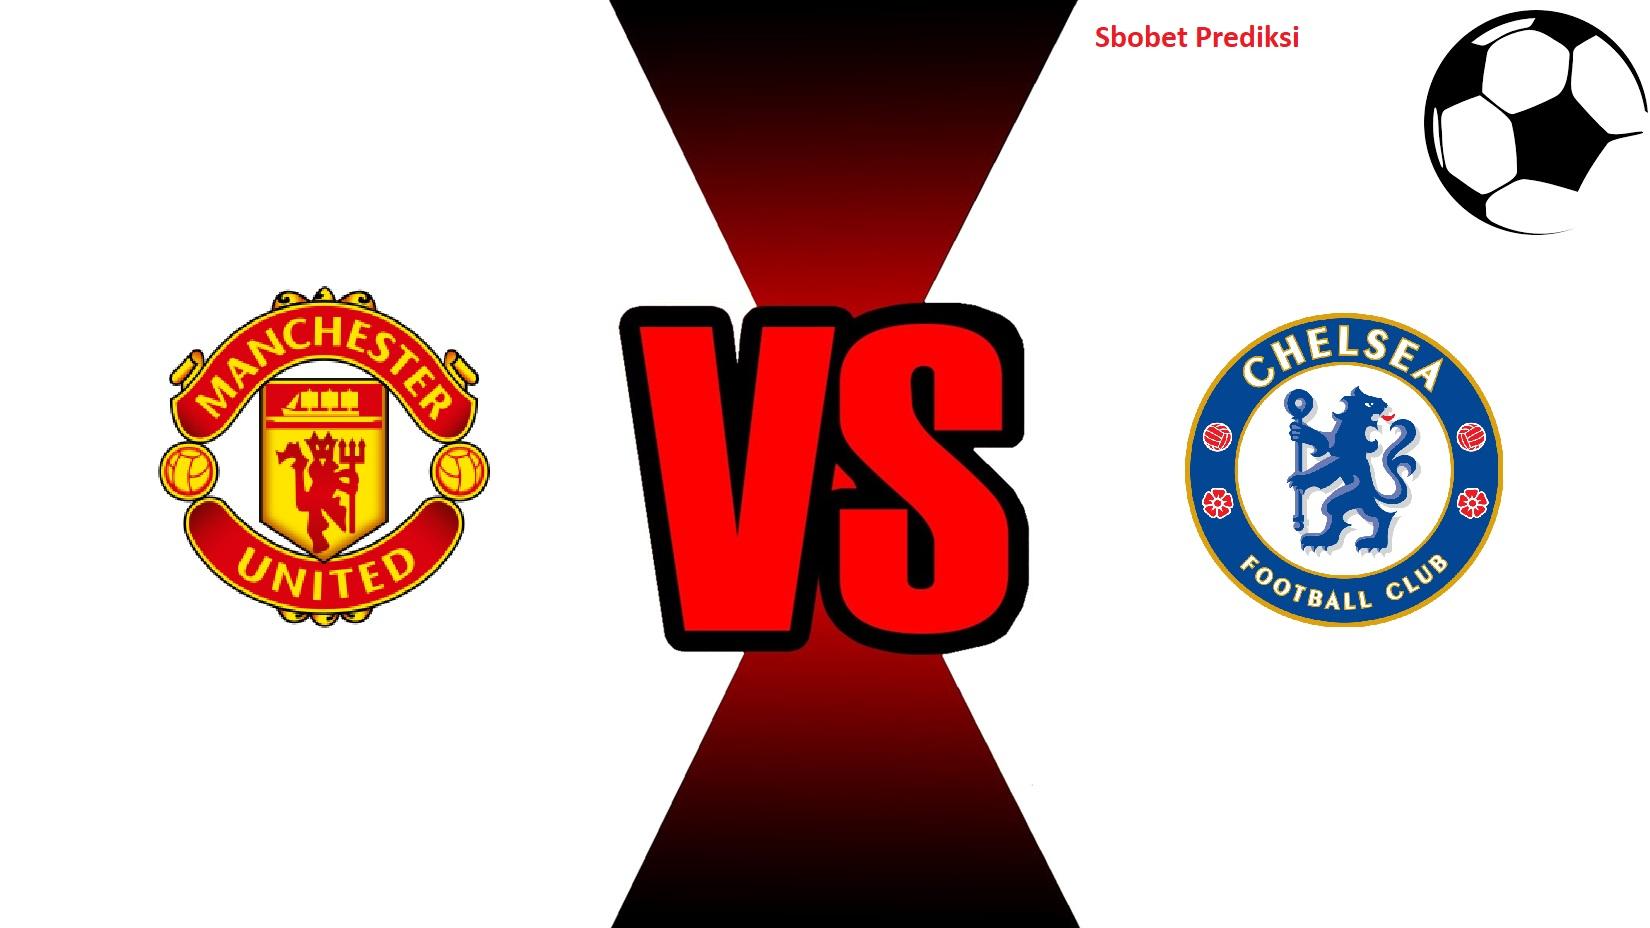 Prediksi Skor Pertandingan Chelsea vs Manchester United 20 Oktober 2018